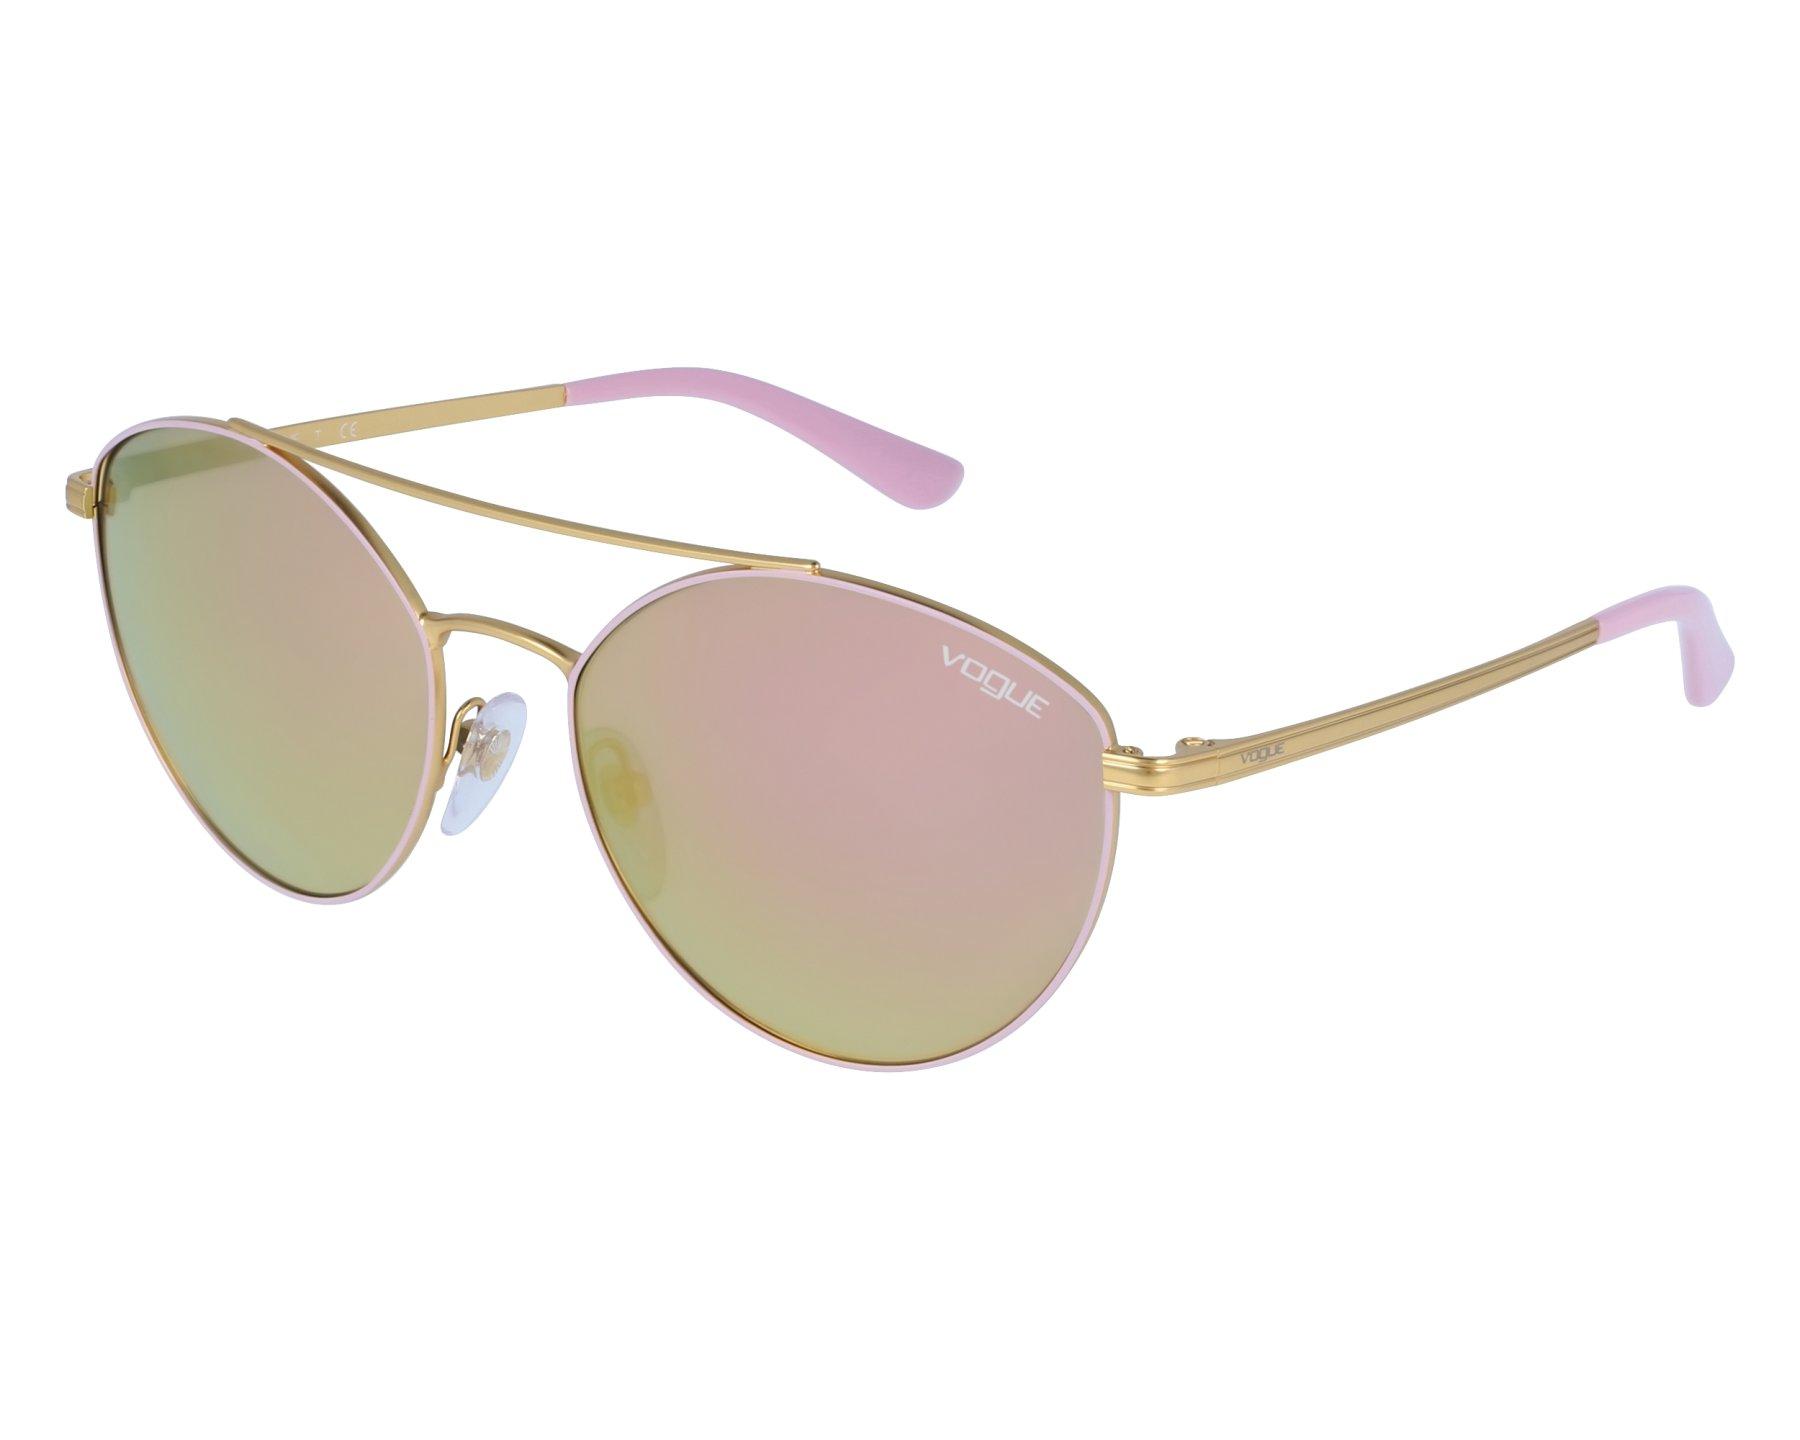 2342a6f658 Gafas de sol Vogue VO-4023-S 50245R 56-18 Rosa Oro vista